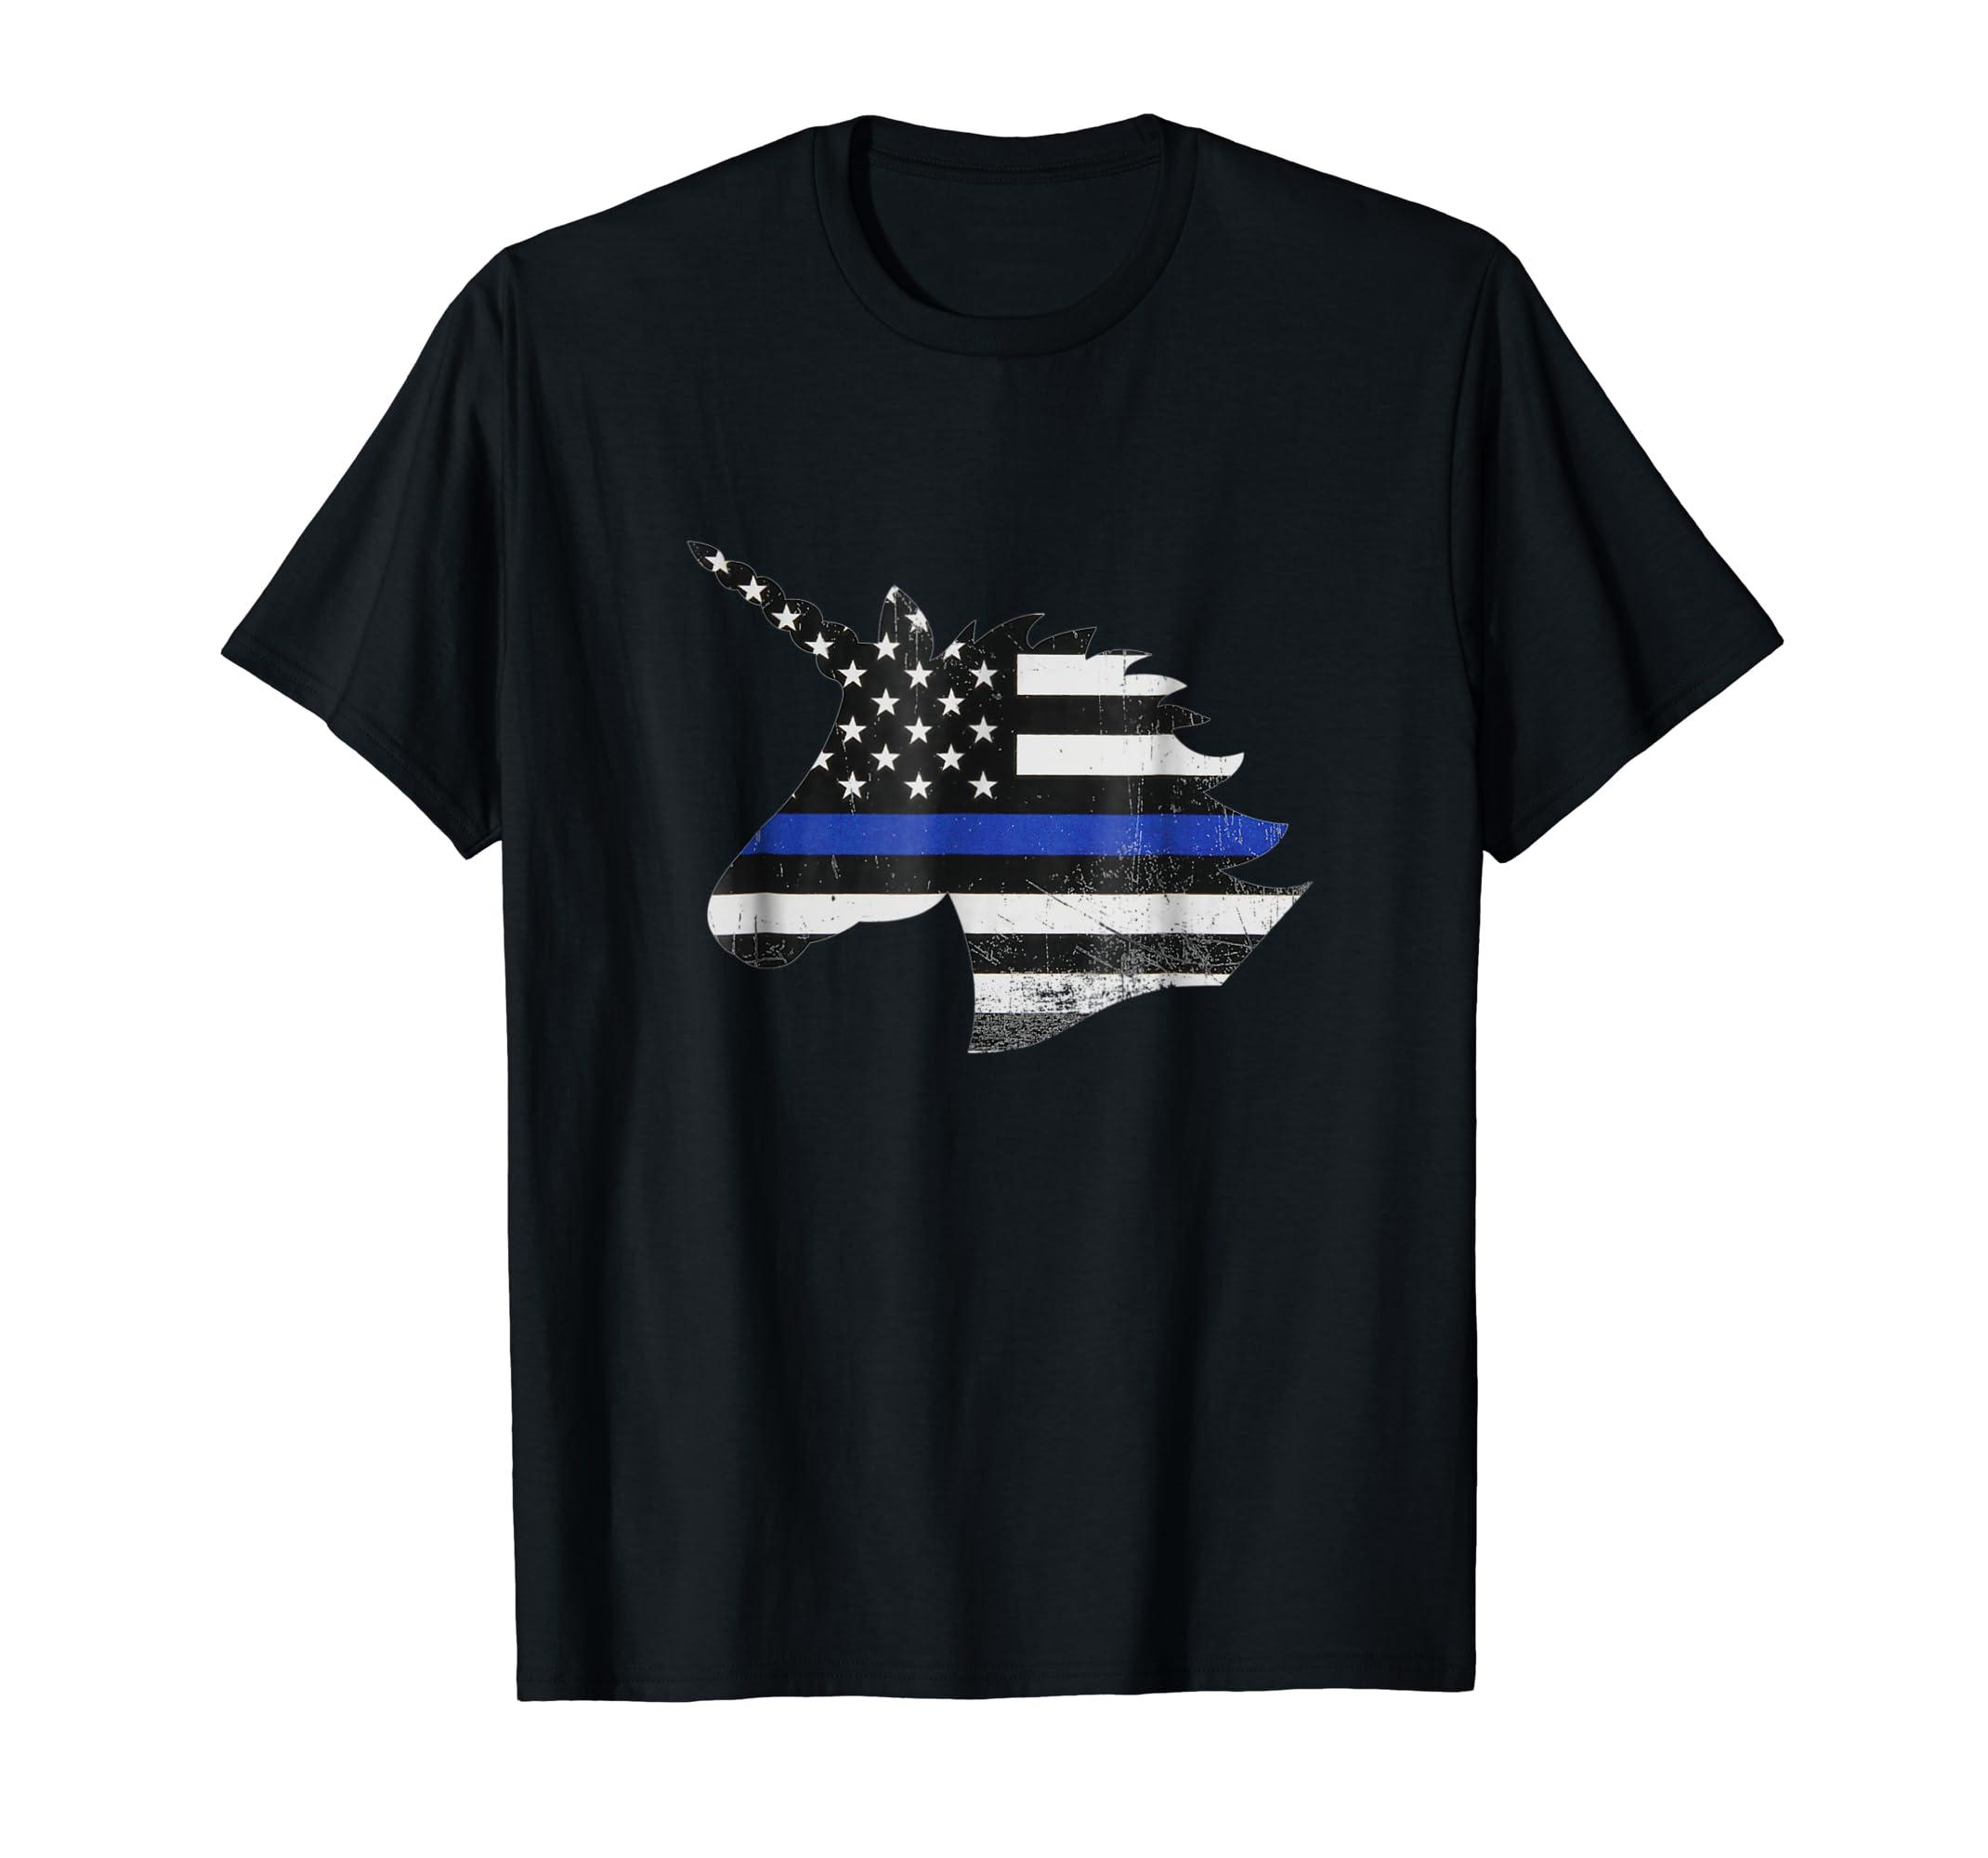 UNICORN THIN BLUE LINE FLAG SHIRT-alottee gift